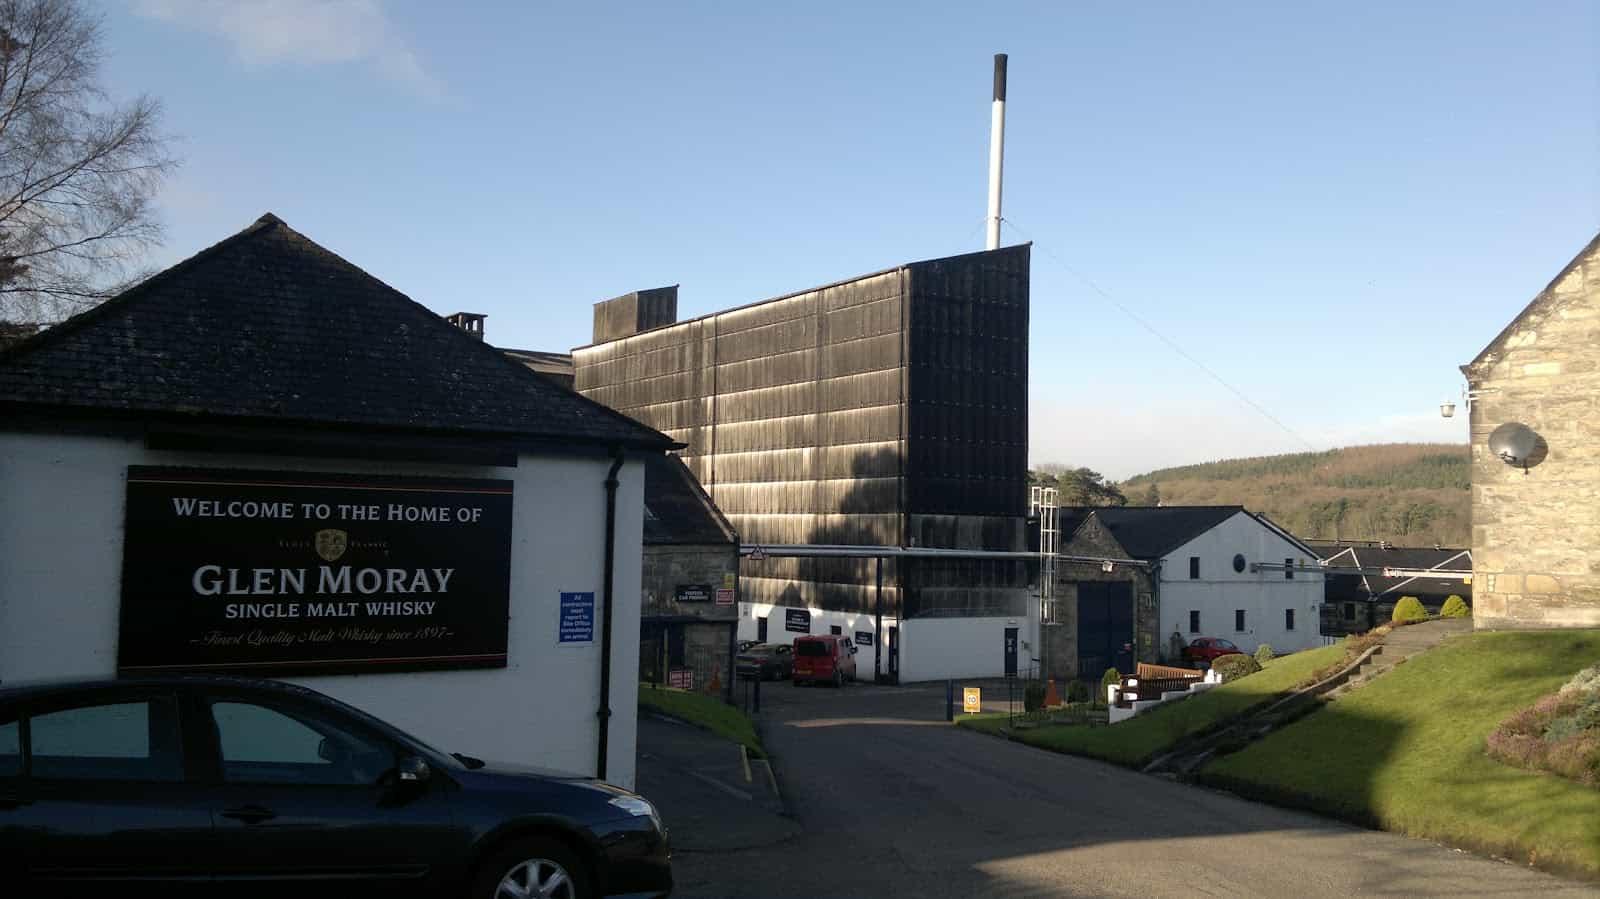 Glen Moray Distillery Tours